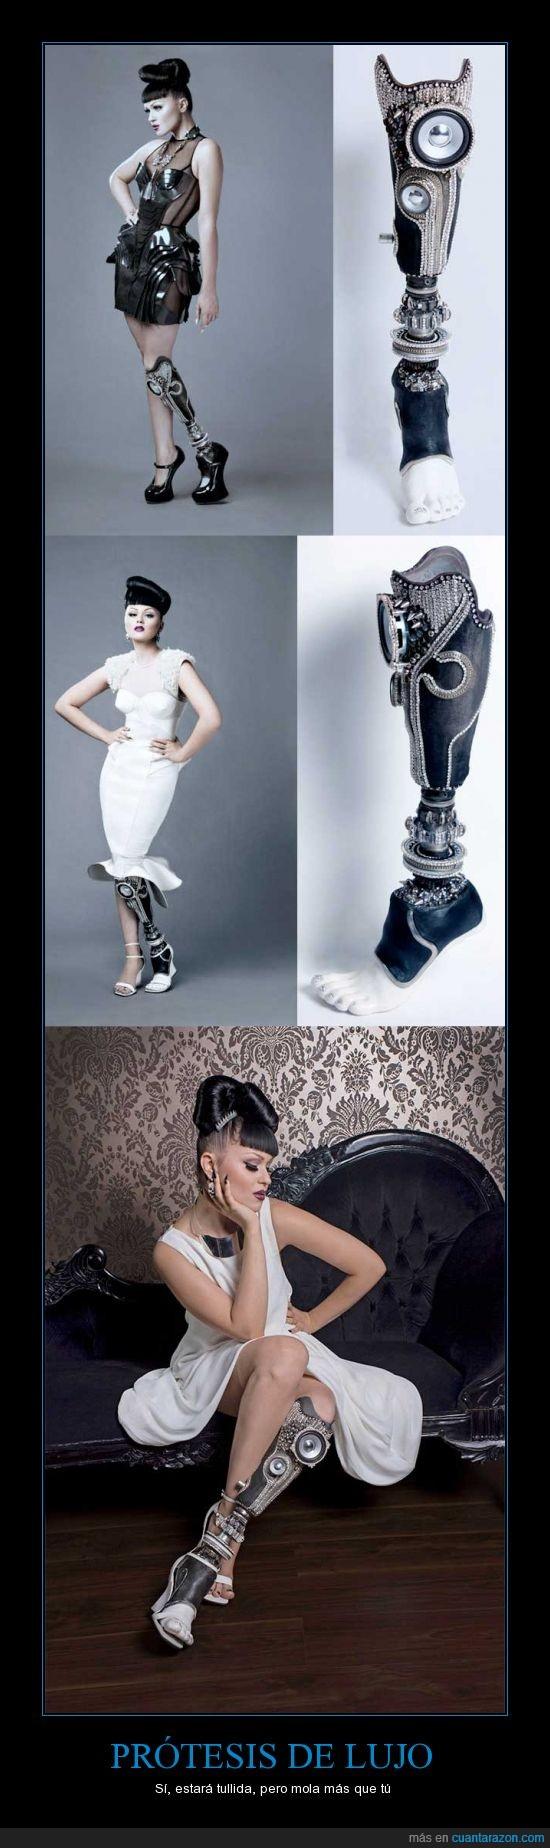 bionica,estilo,pierna,protesis,zapato